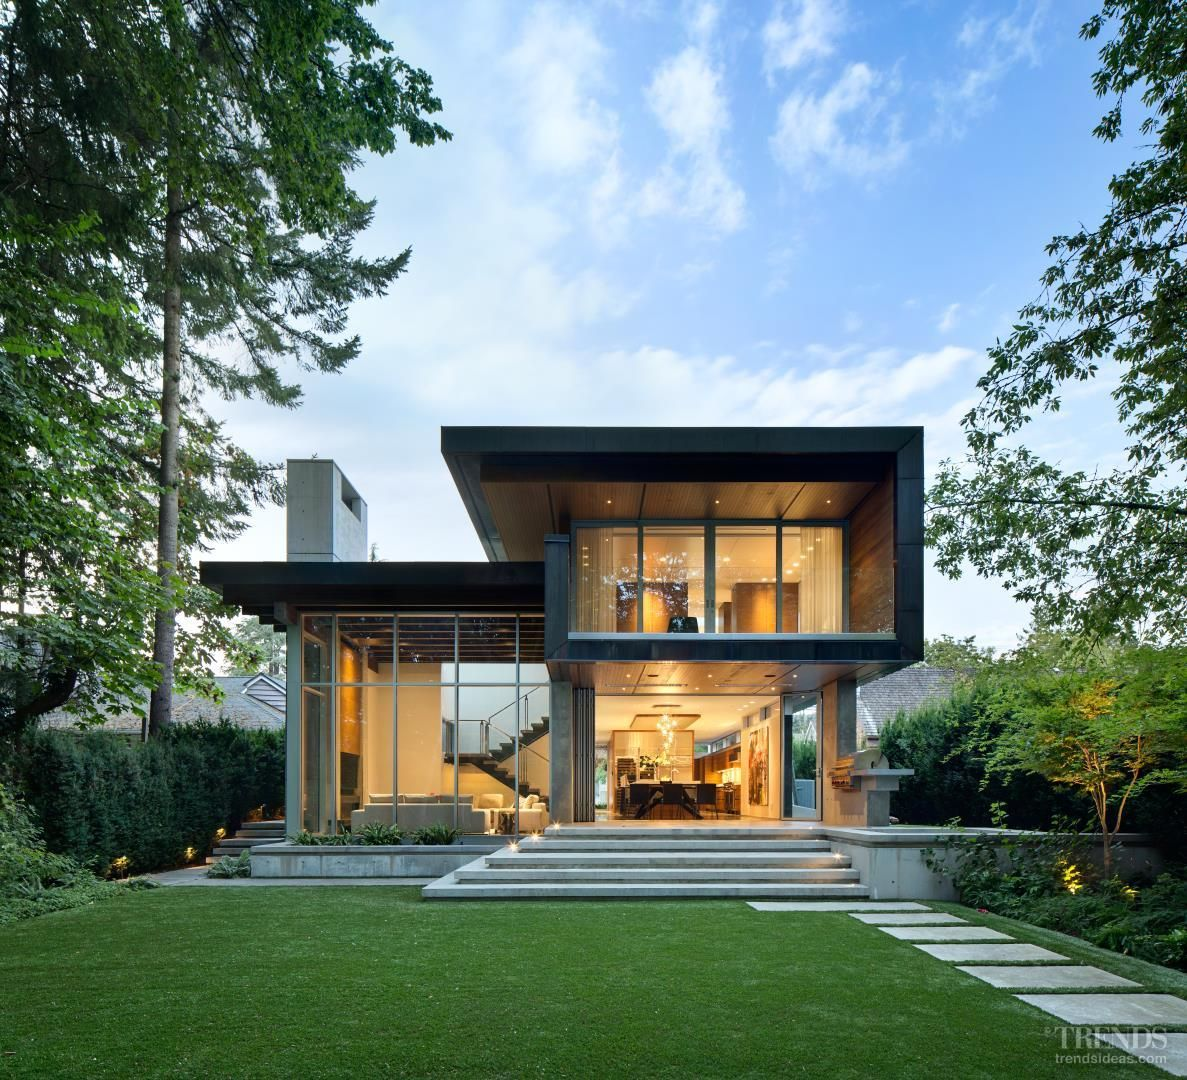 Pin von Narin Srimongklon auf architecture | Pinterest